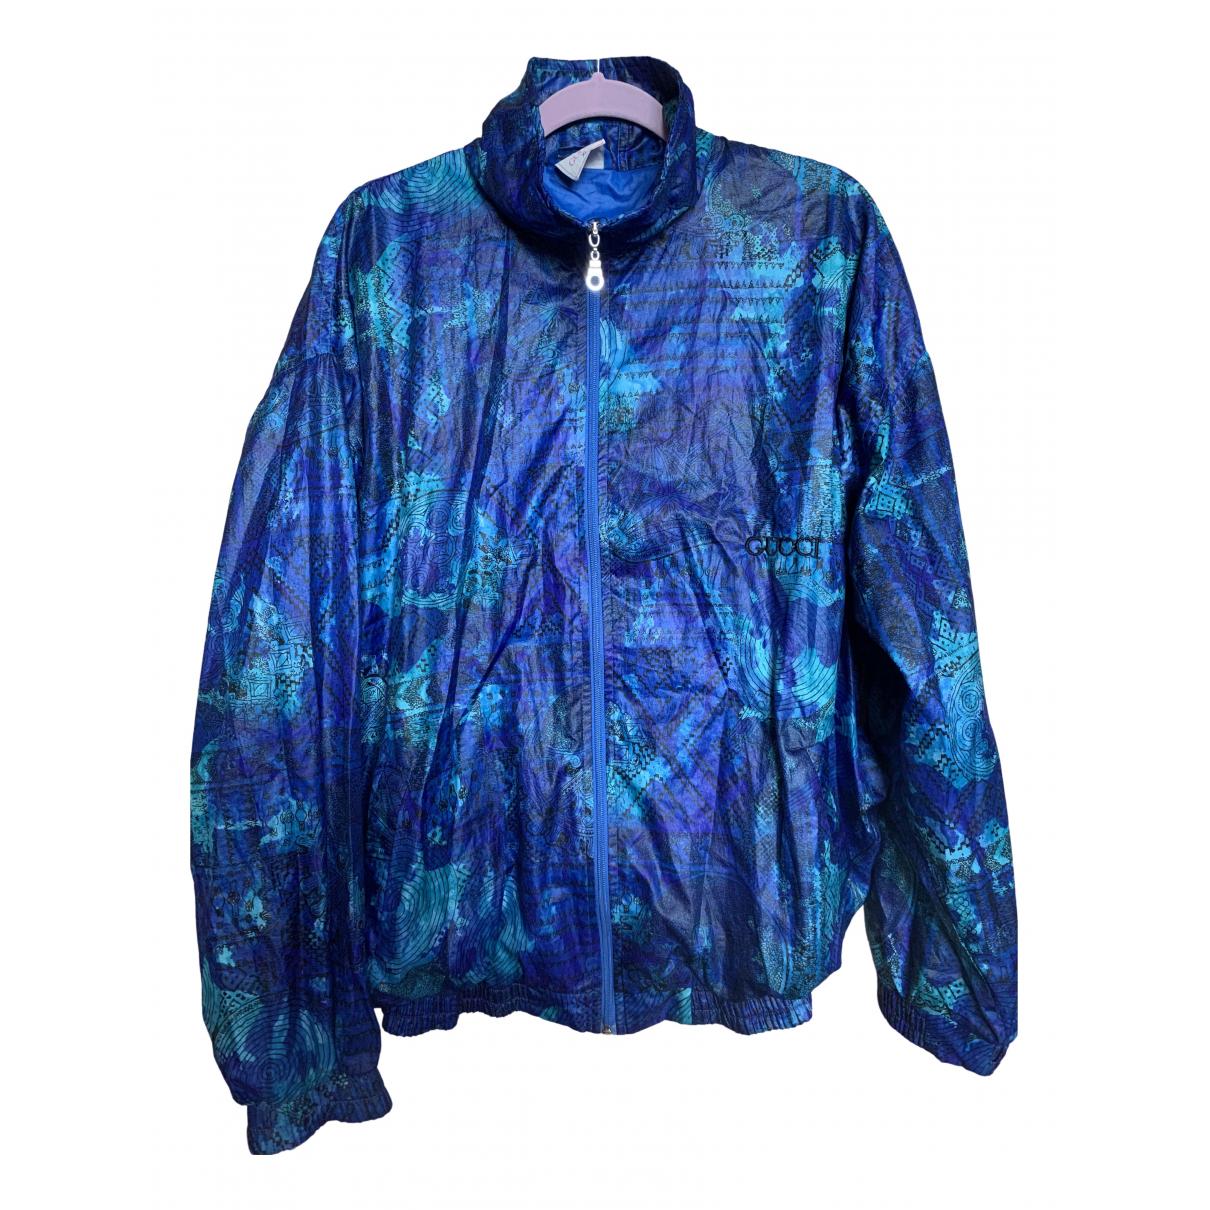 Gucci \N Jacke in  Bunt Polyester